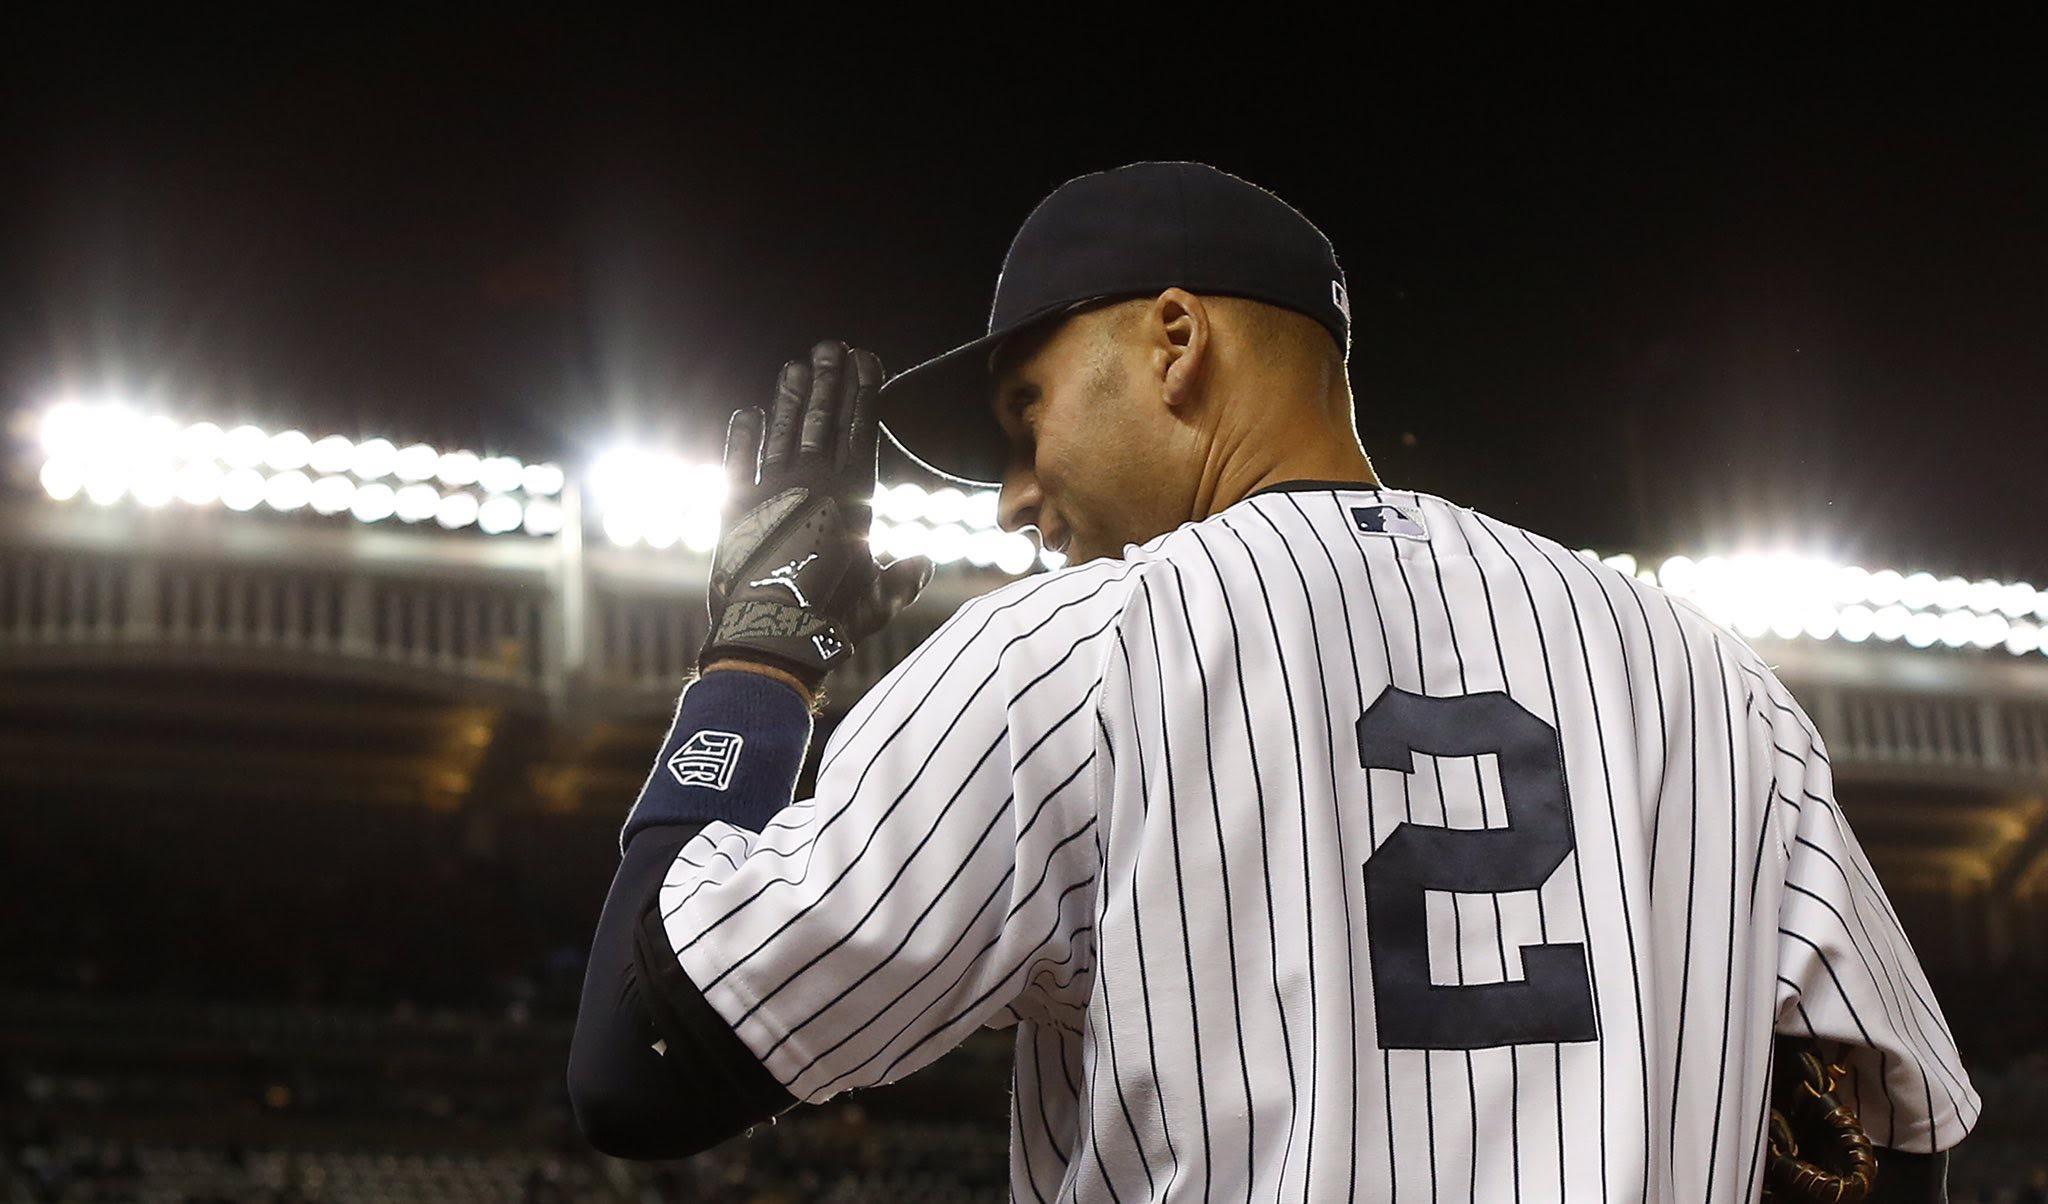 photo credit: New York Yankees